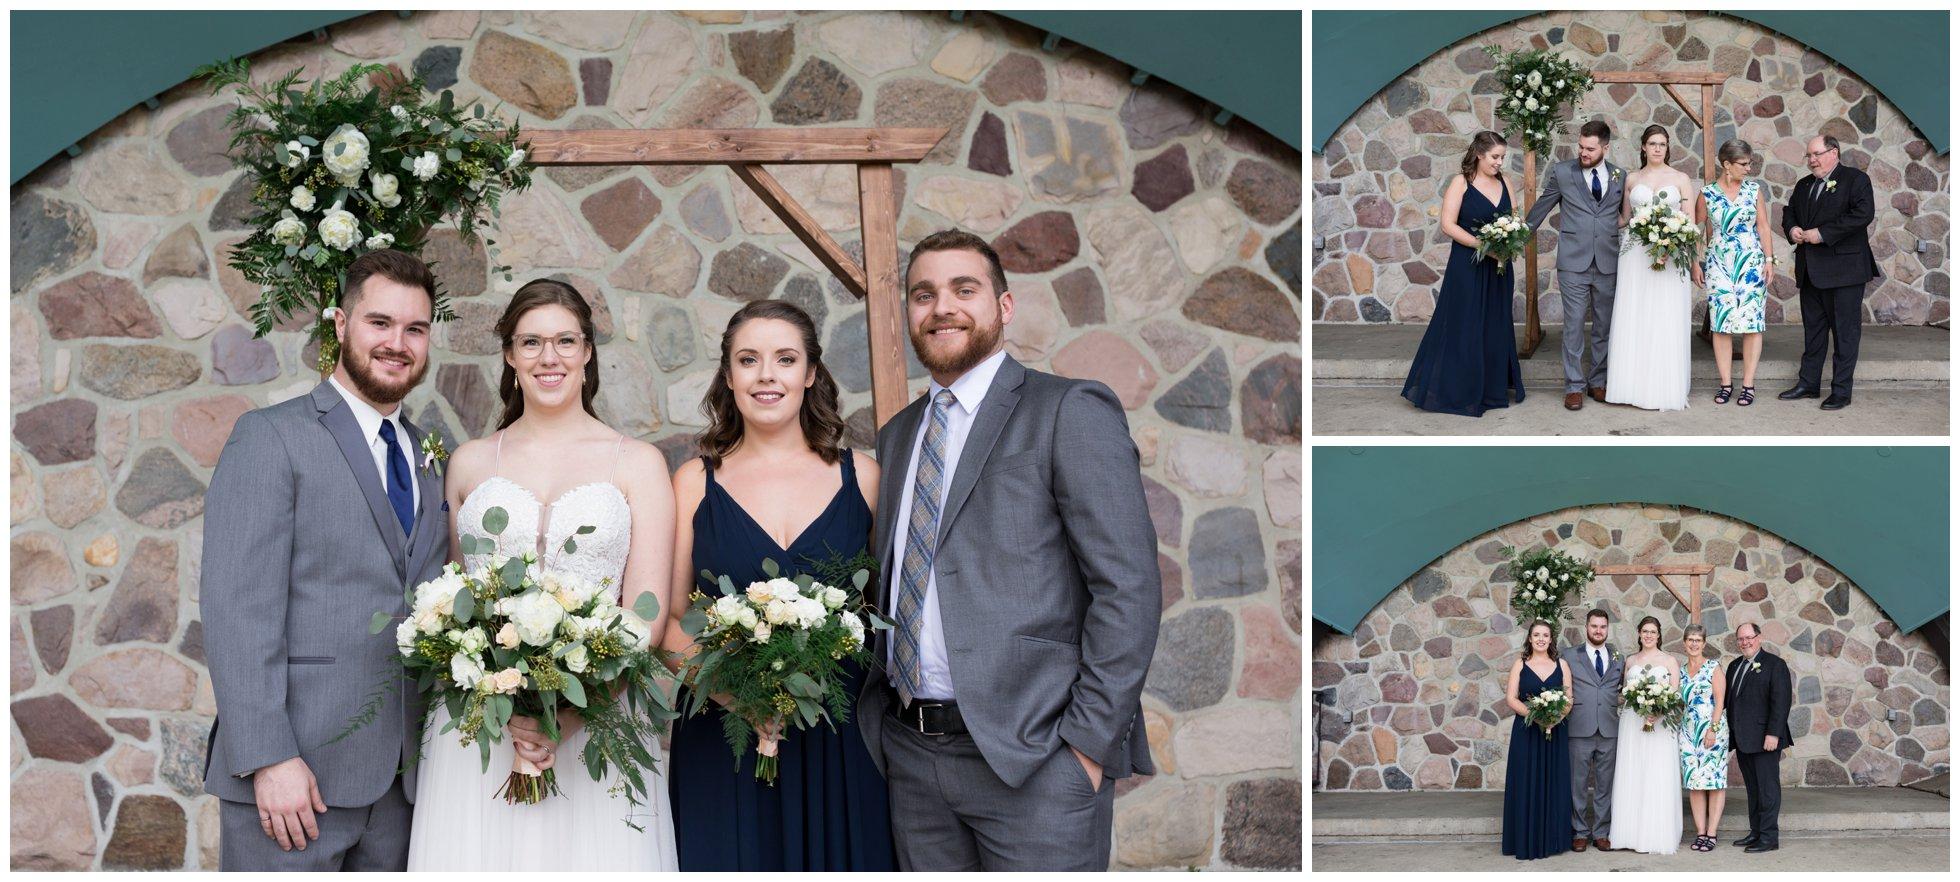 Emily and Royden Edmonton Wedding (Life by Selena Photography)_0019.jpg